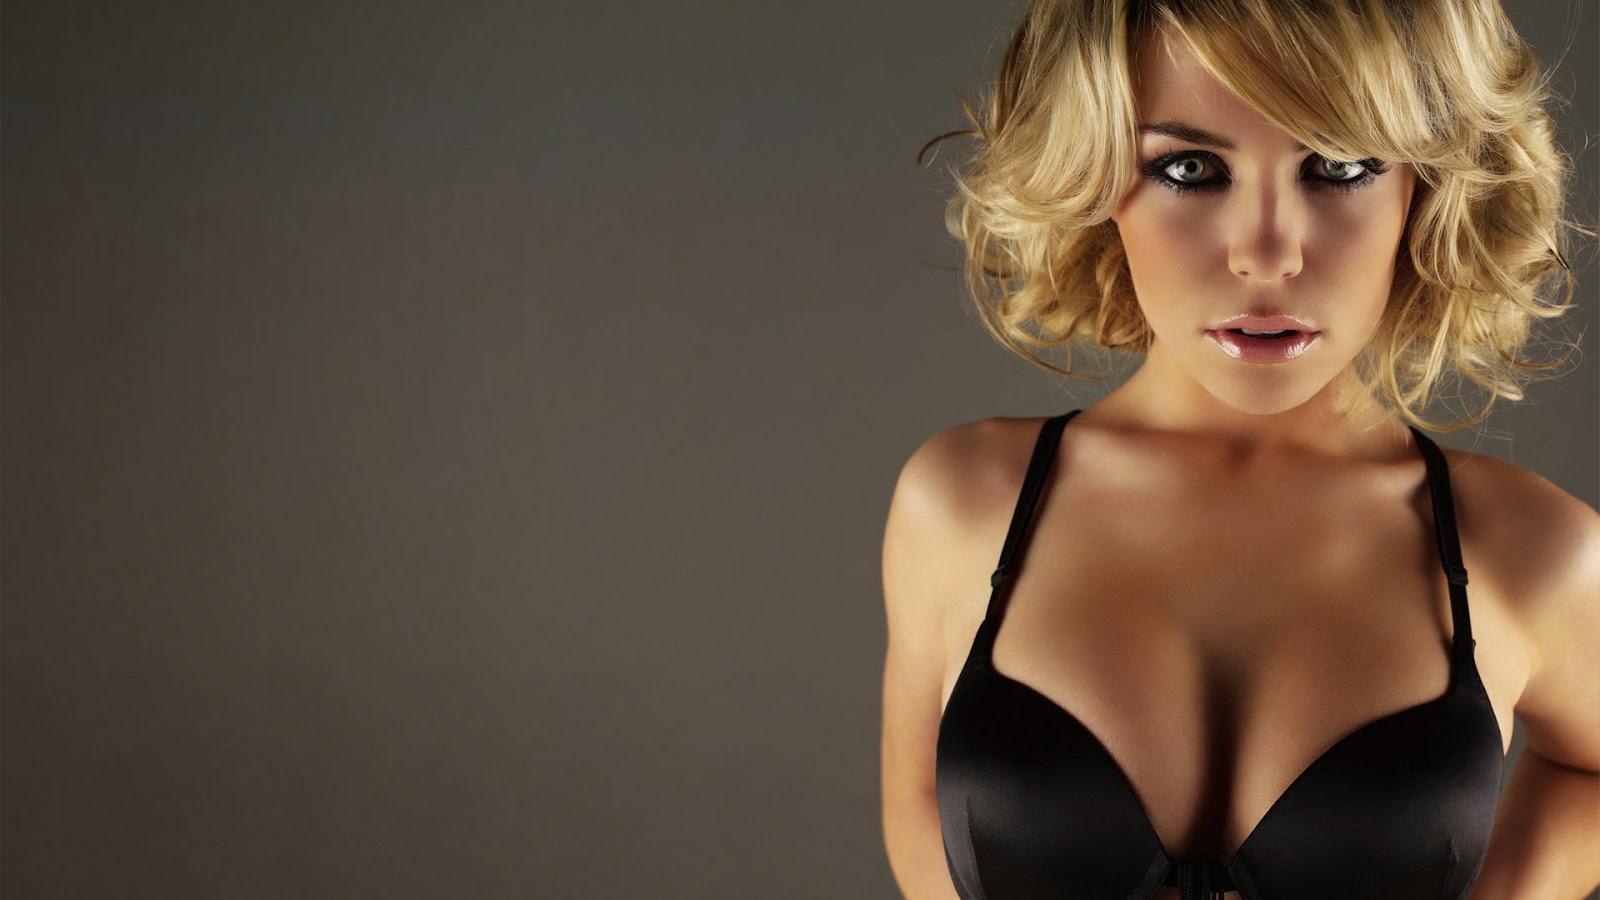 Hot Abigail Clancy